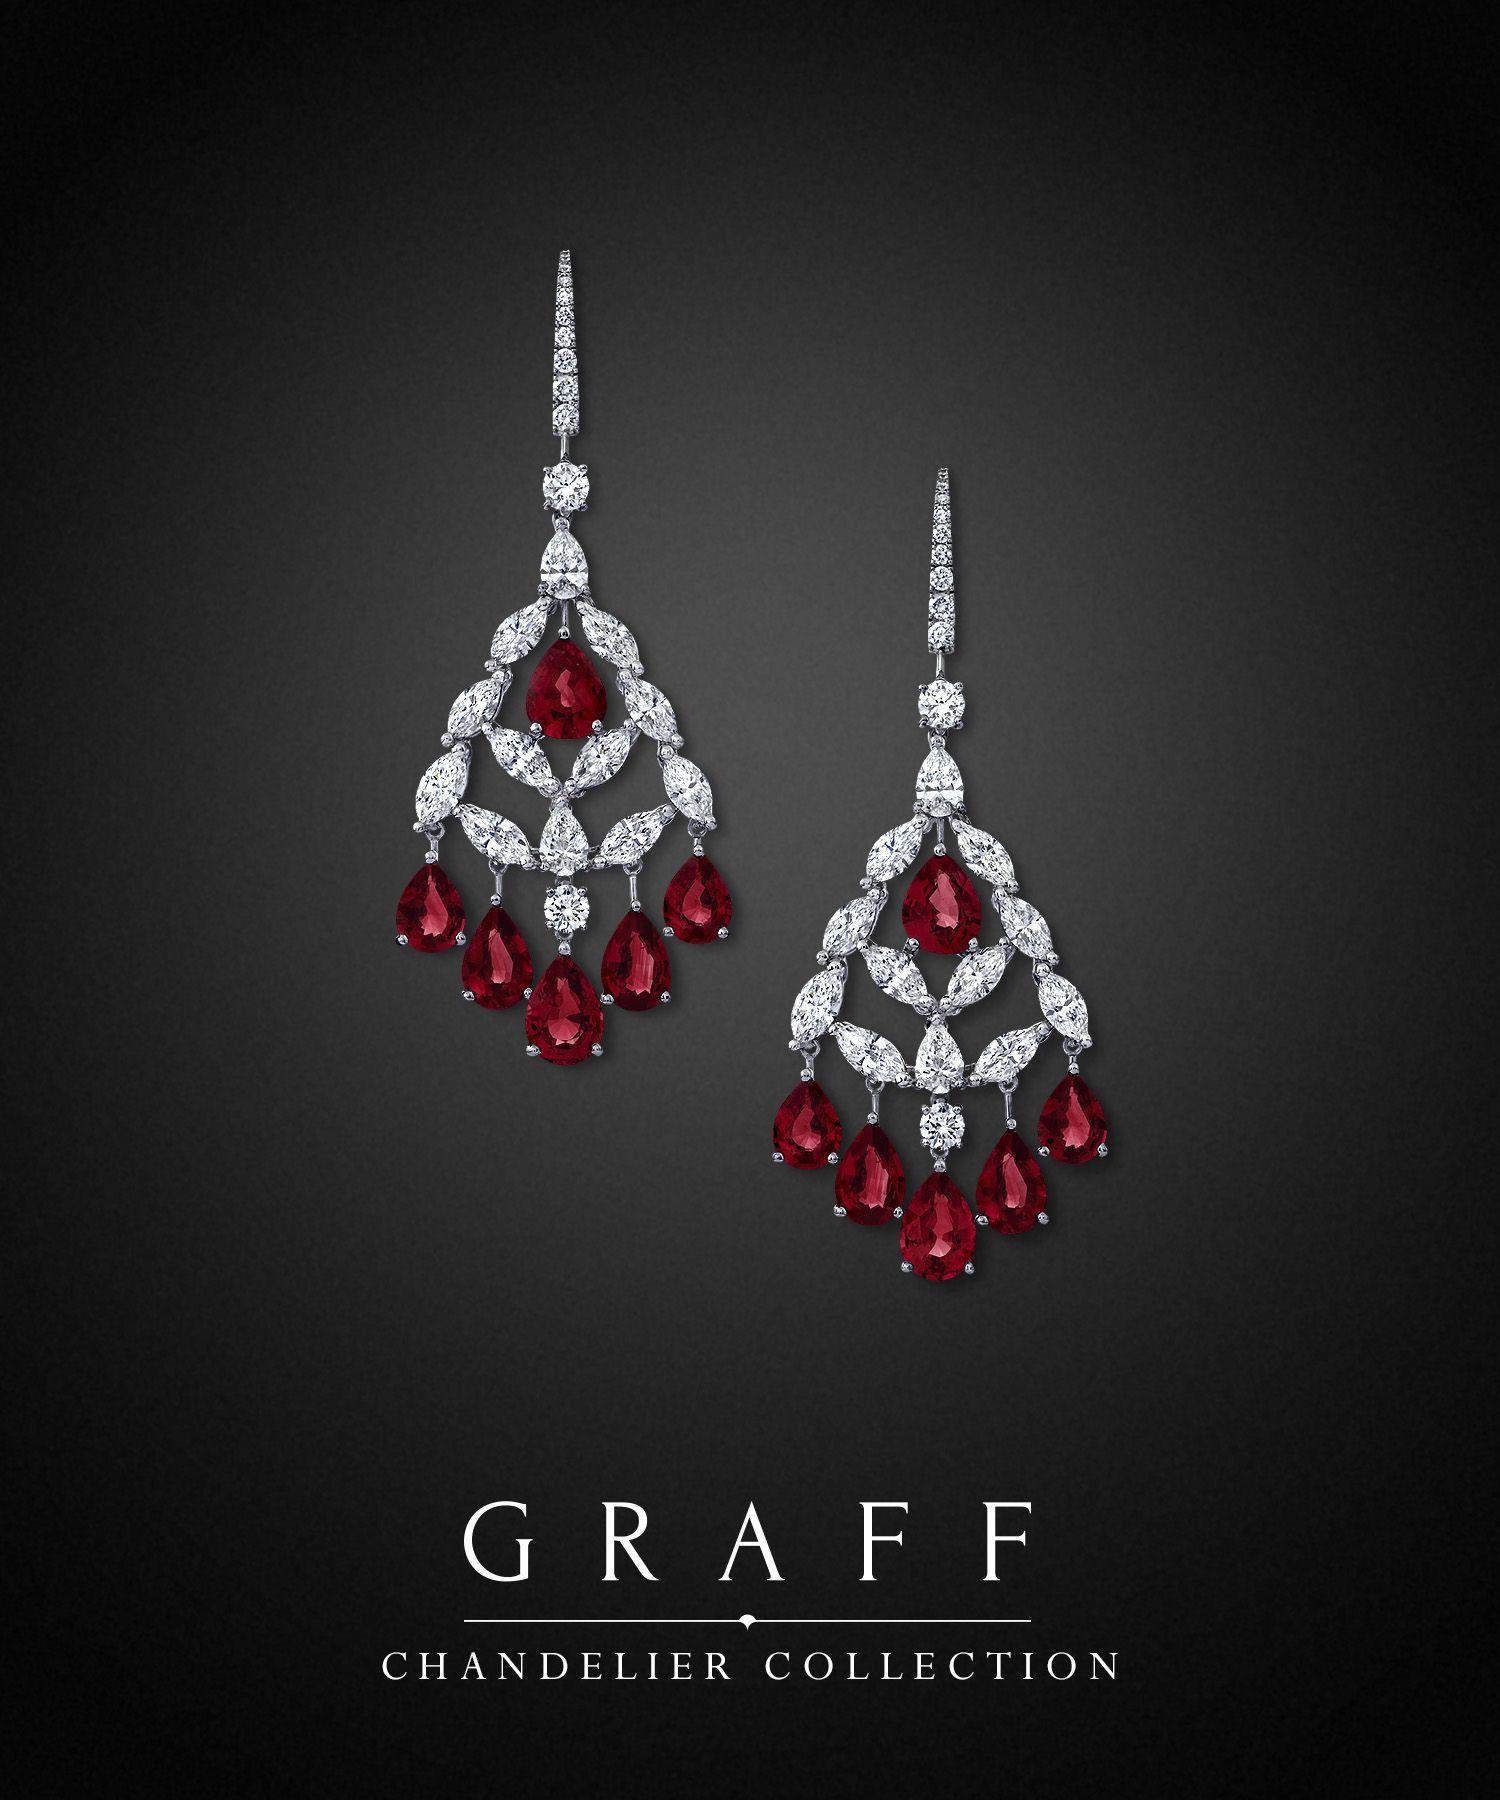 Ruby and diamond chandelier earrings chandelier collection from ruby and diamond chandelier earrings chandelier collection from graff diamonds arubaitofo Choice Image